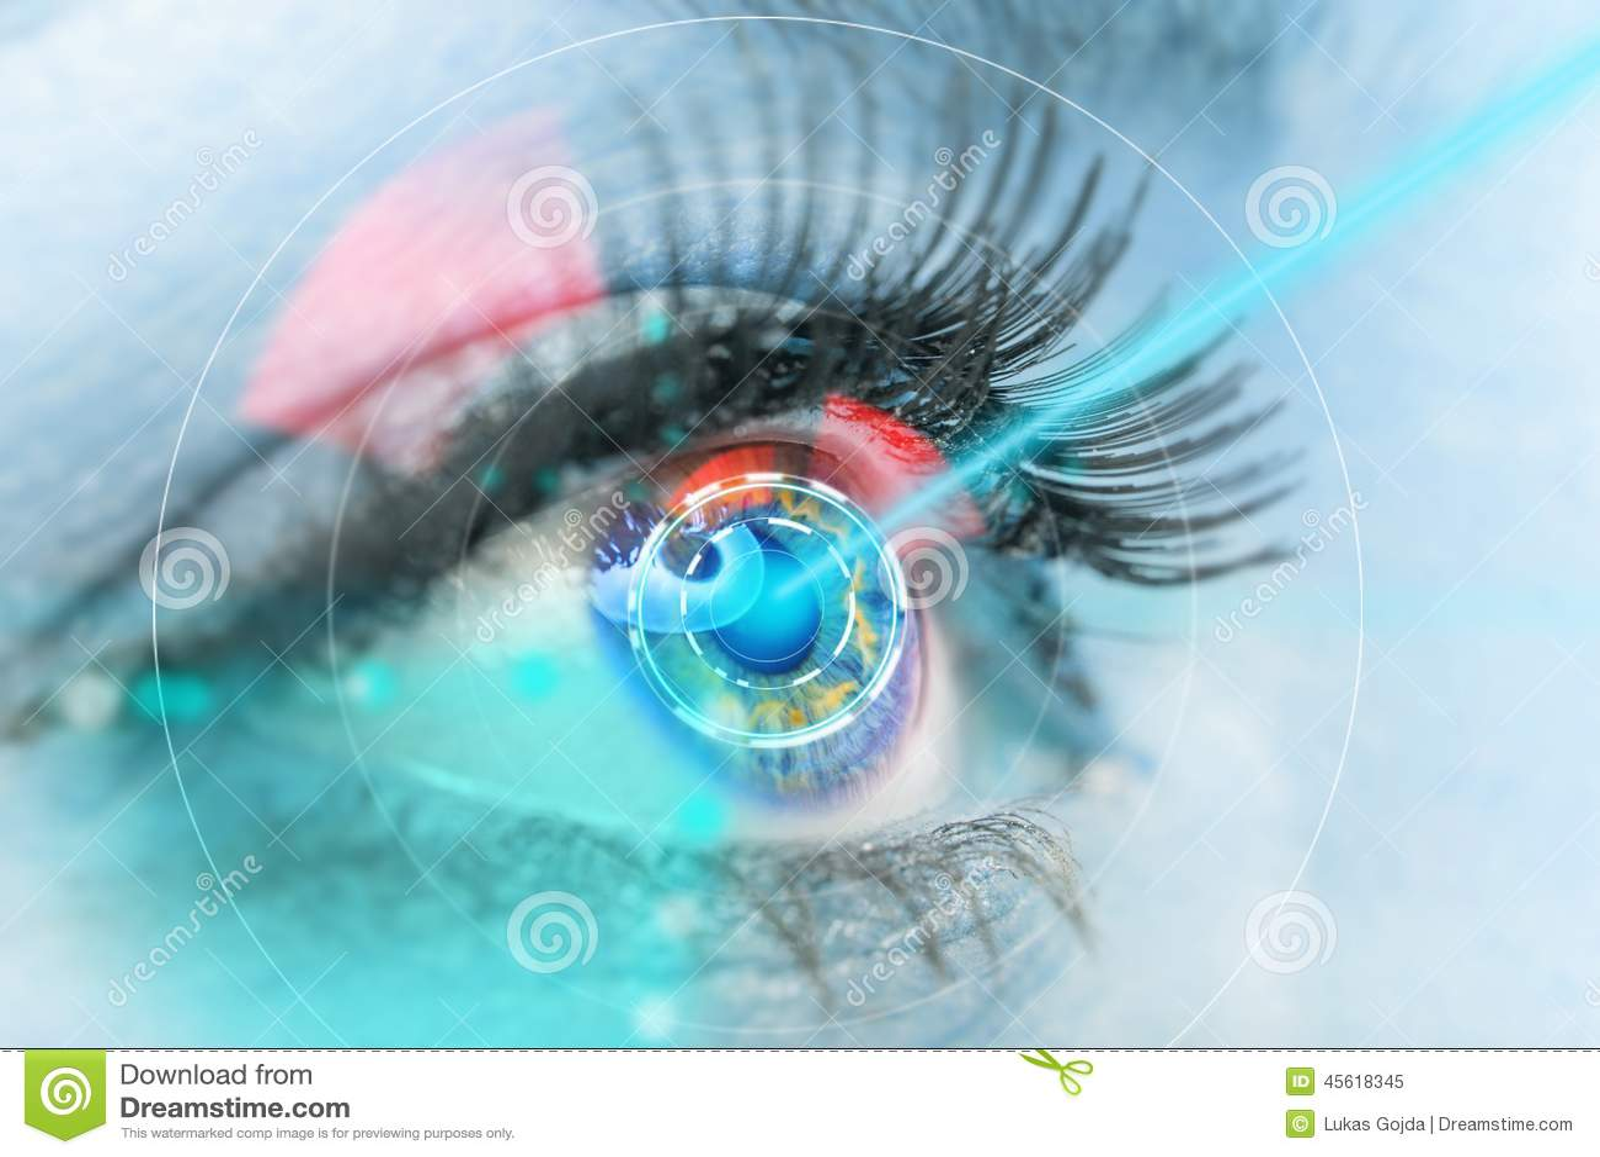 Eye Color Laser Surgery